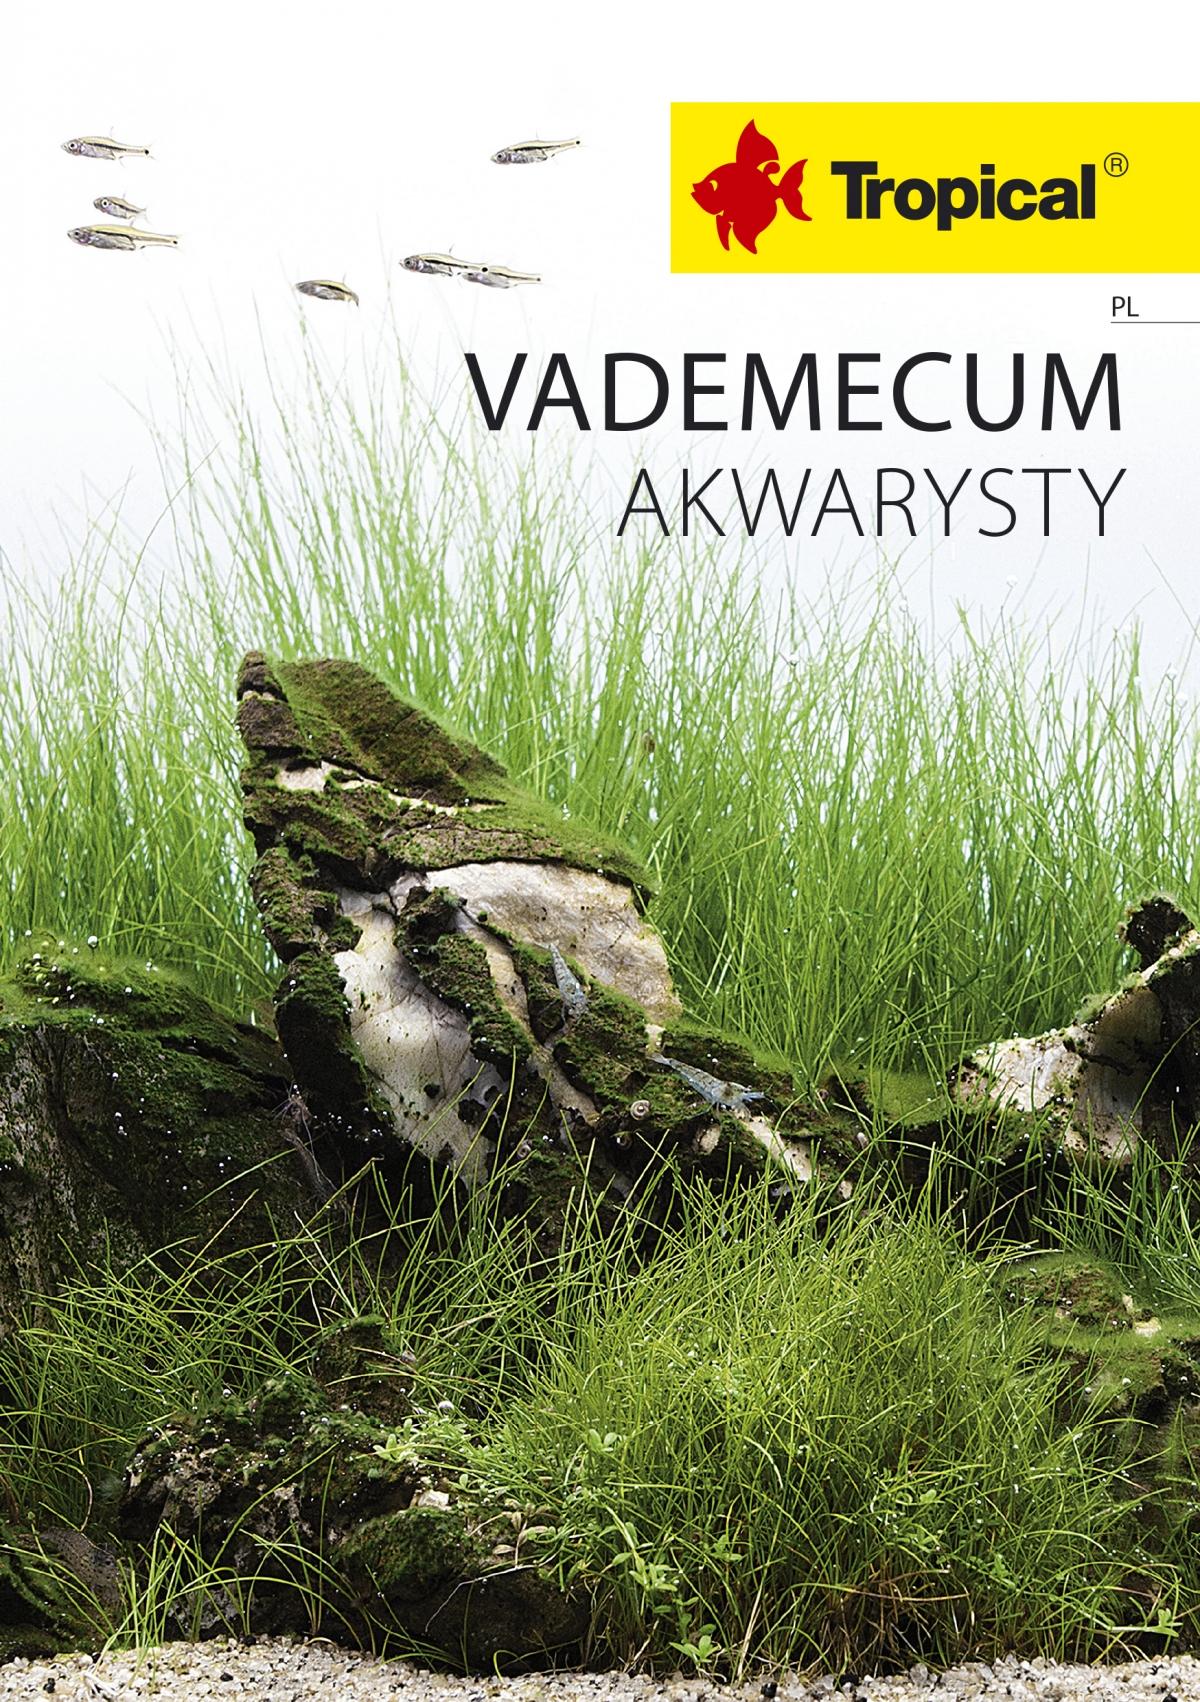 TROPICAL Vademecum Akwarysty 2018 - PL